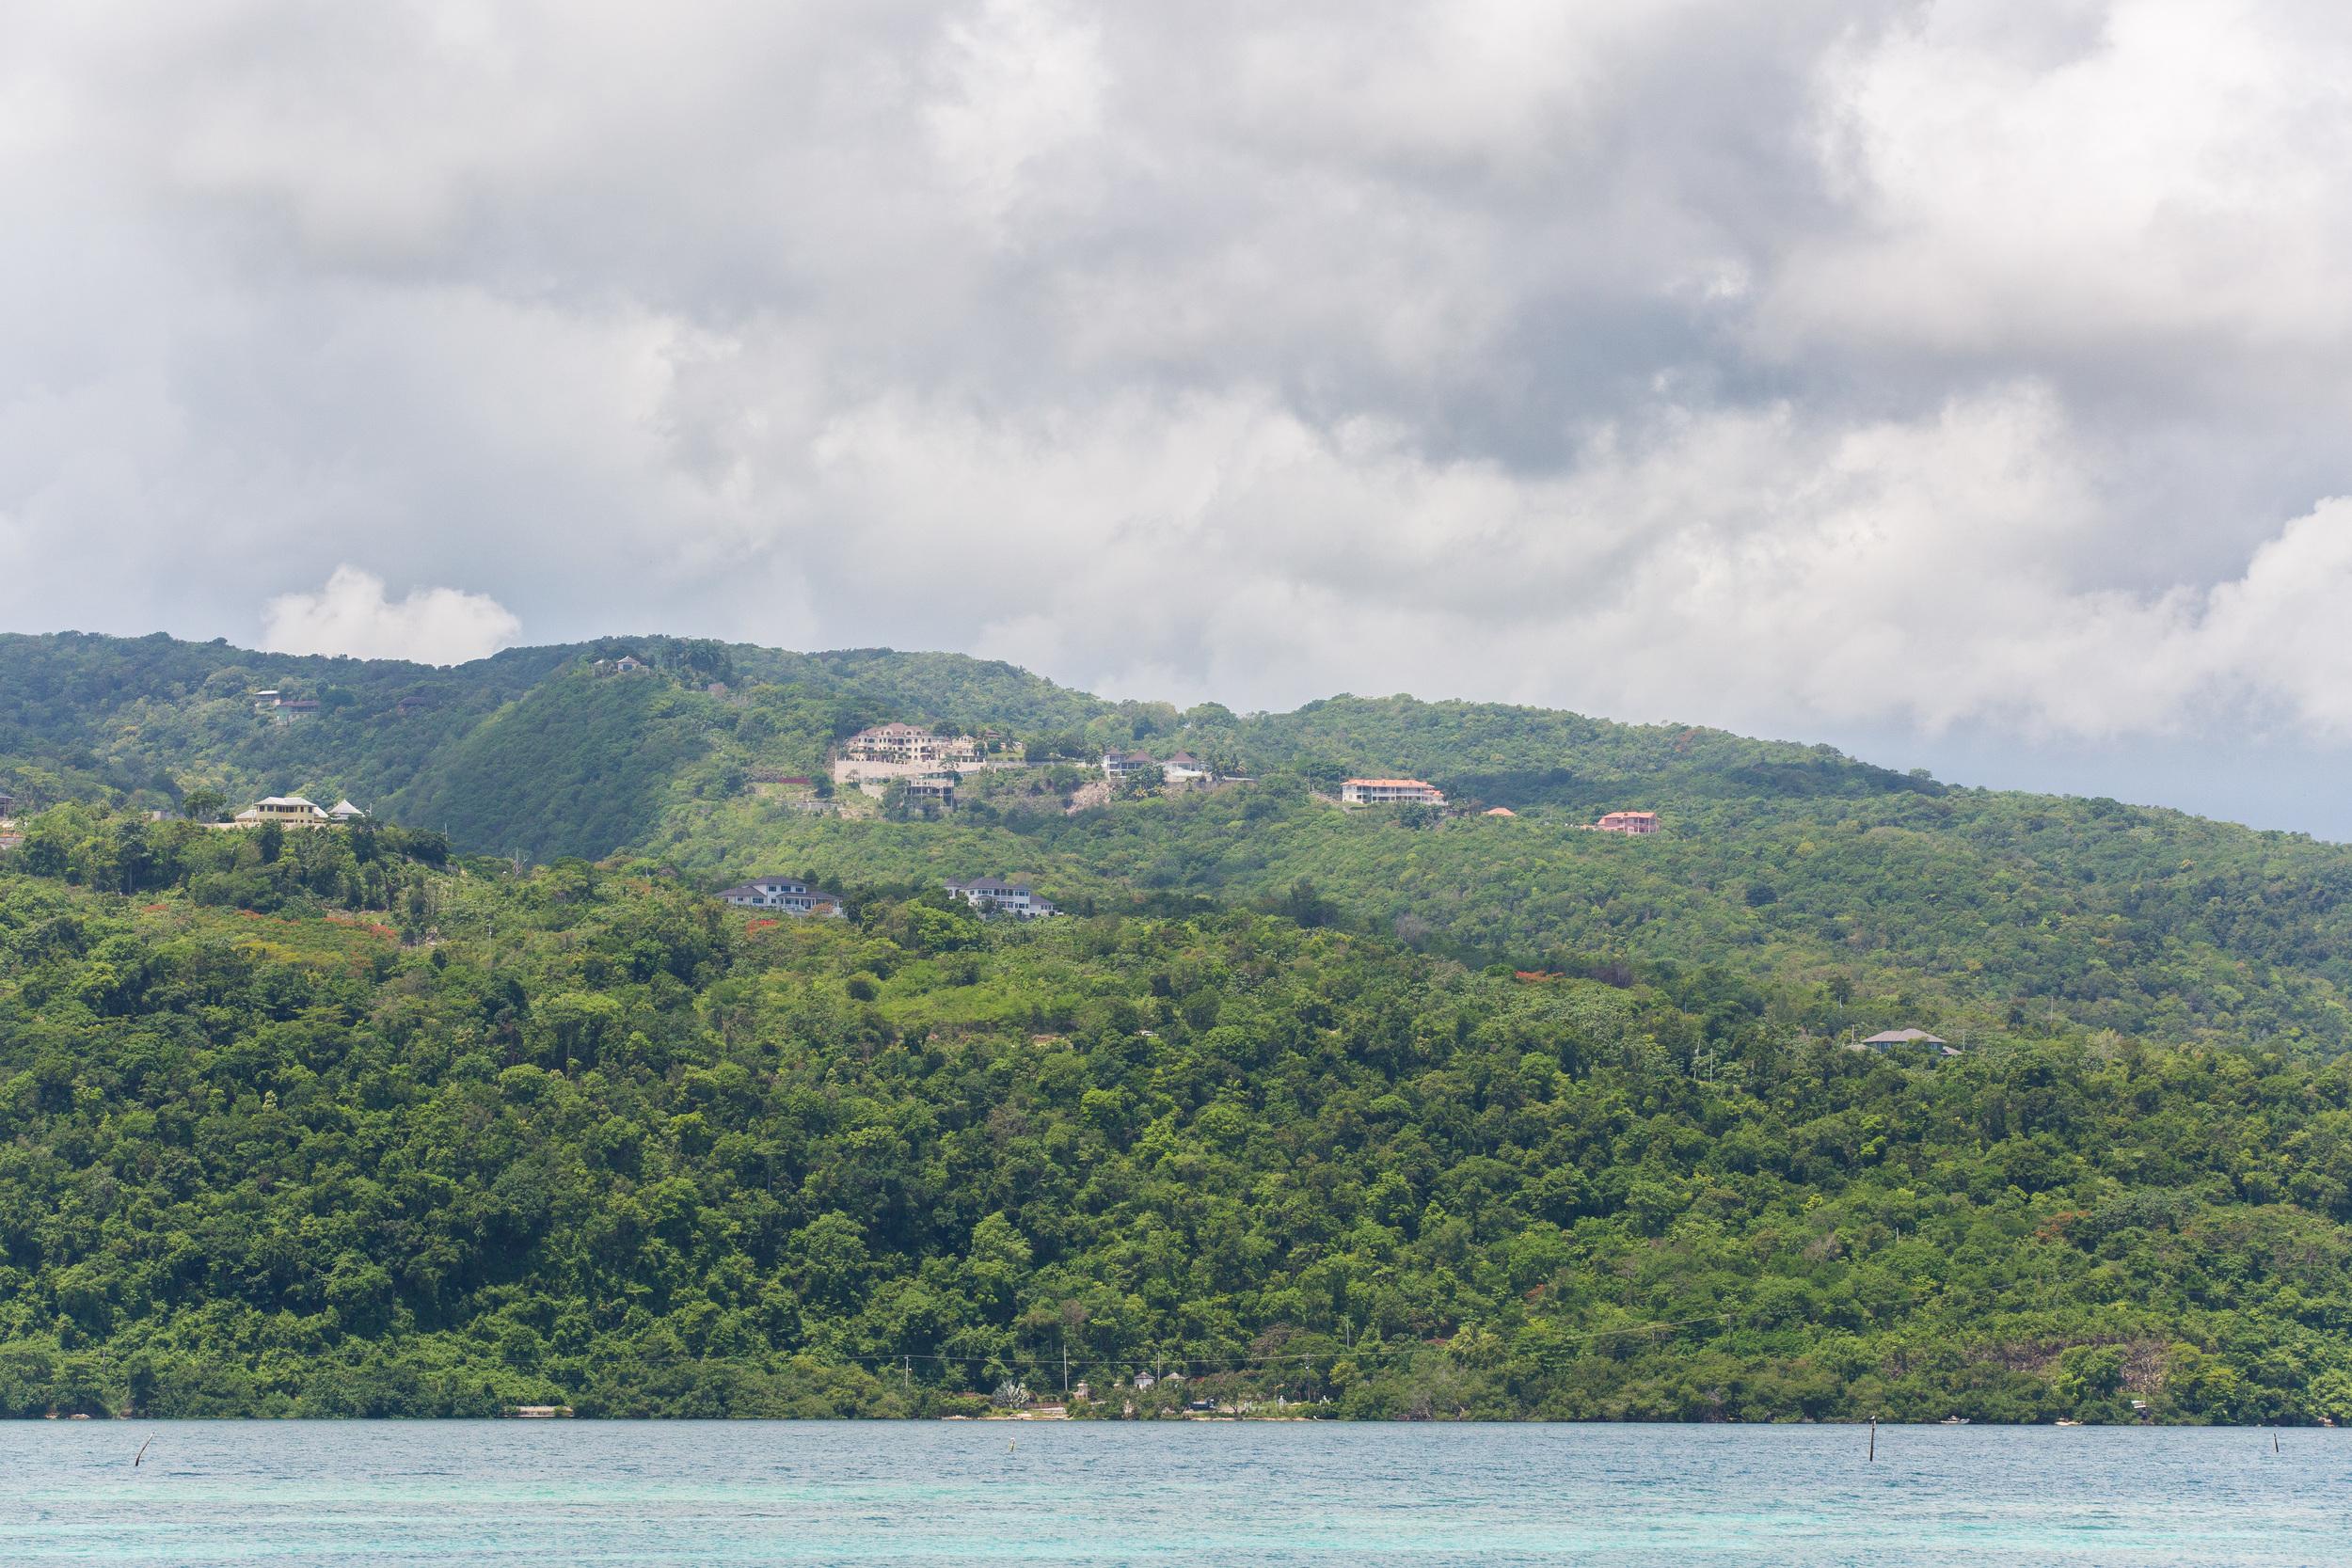 jamaicawedding2014 (18 of 146).jpg